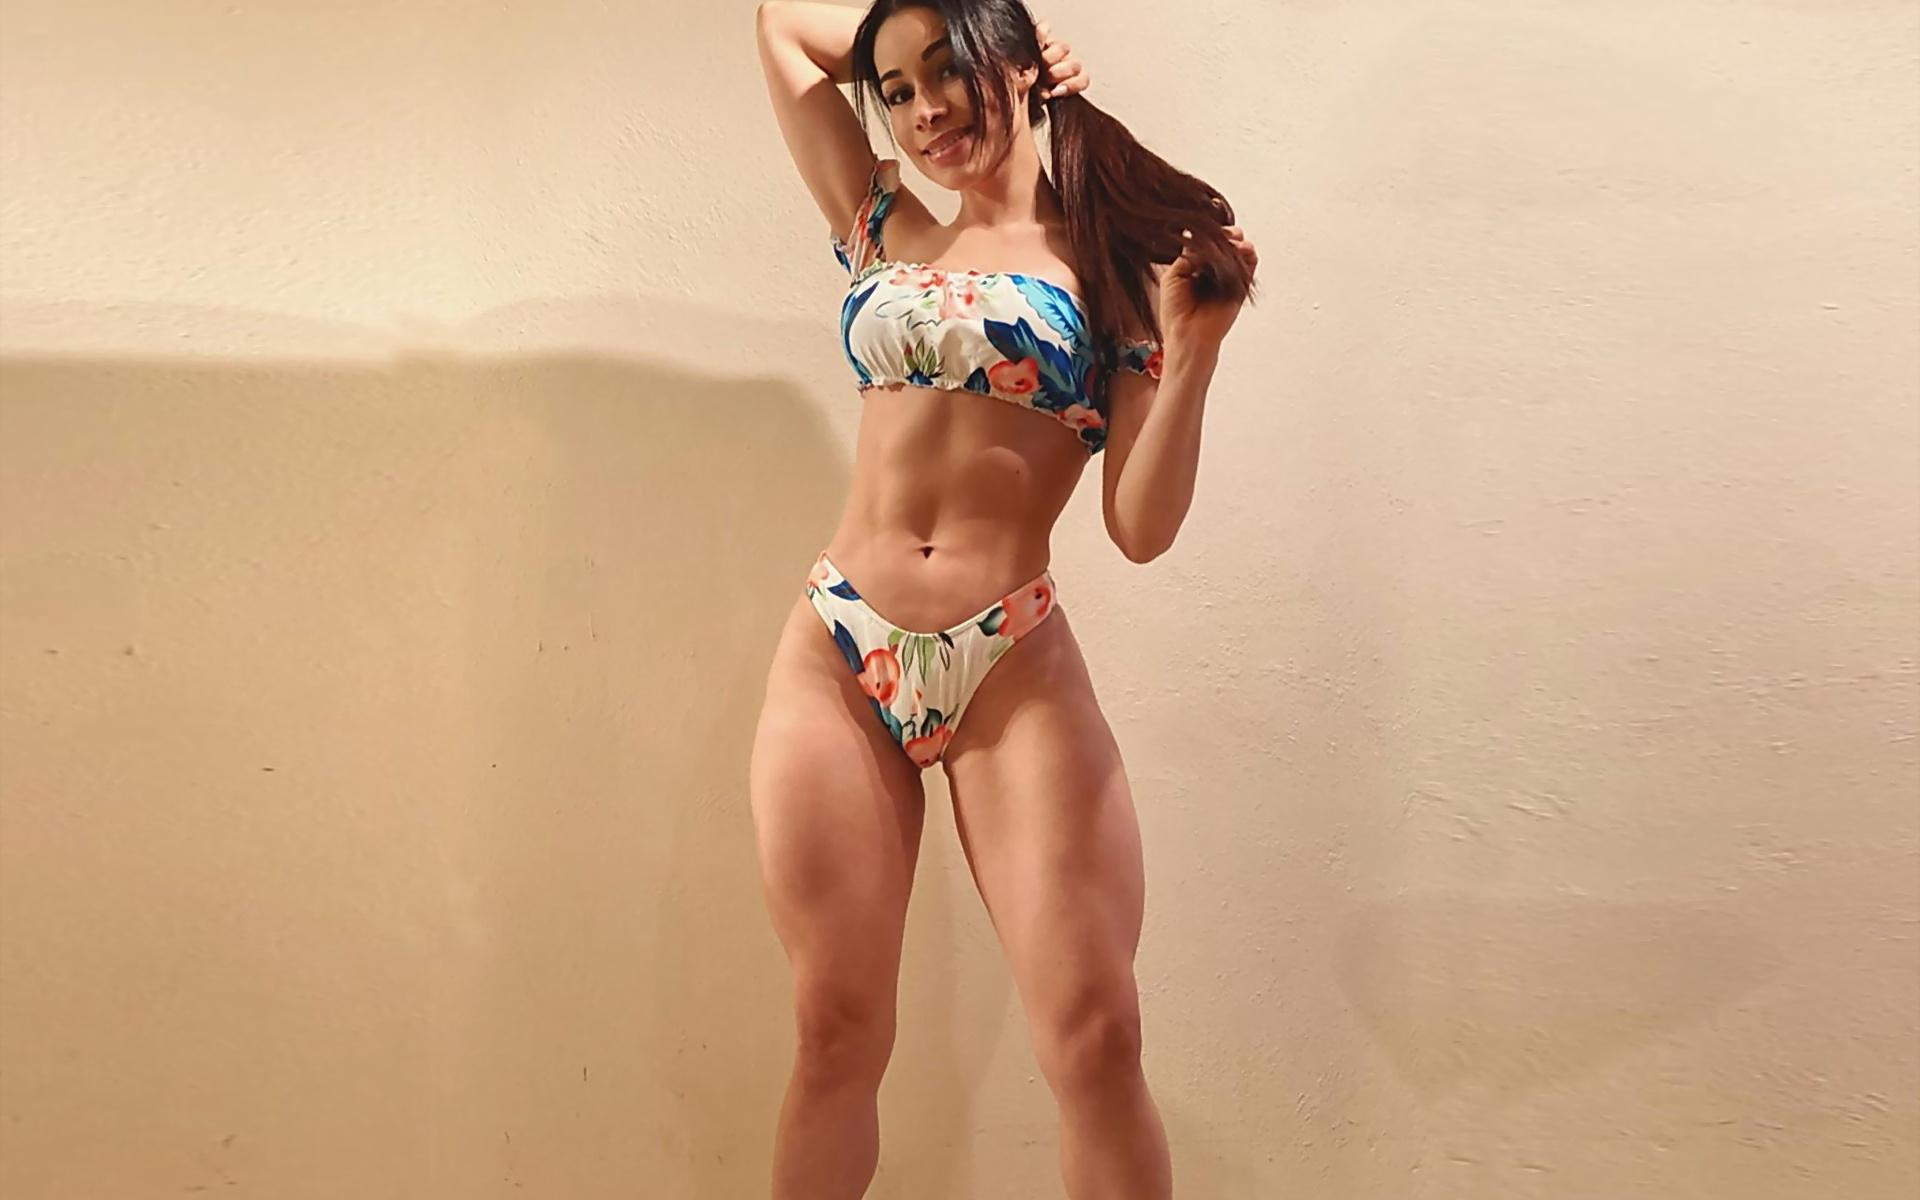 yuliett torres, девушка, модель, фотошоп